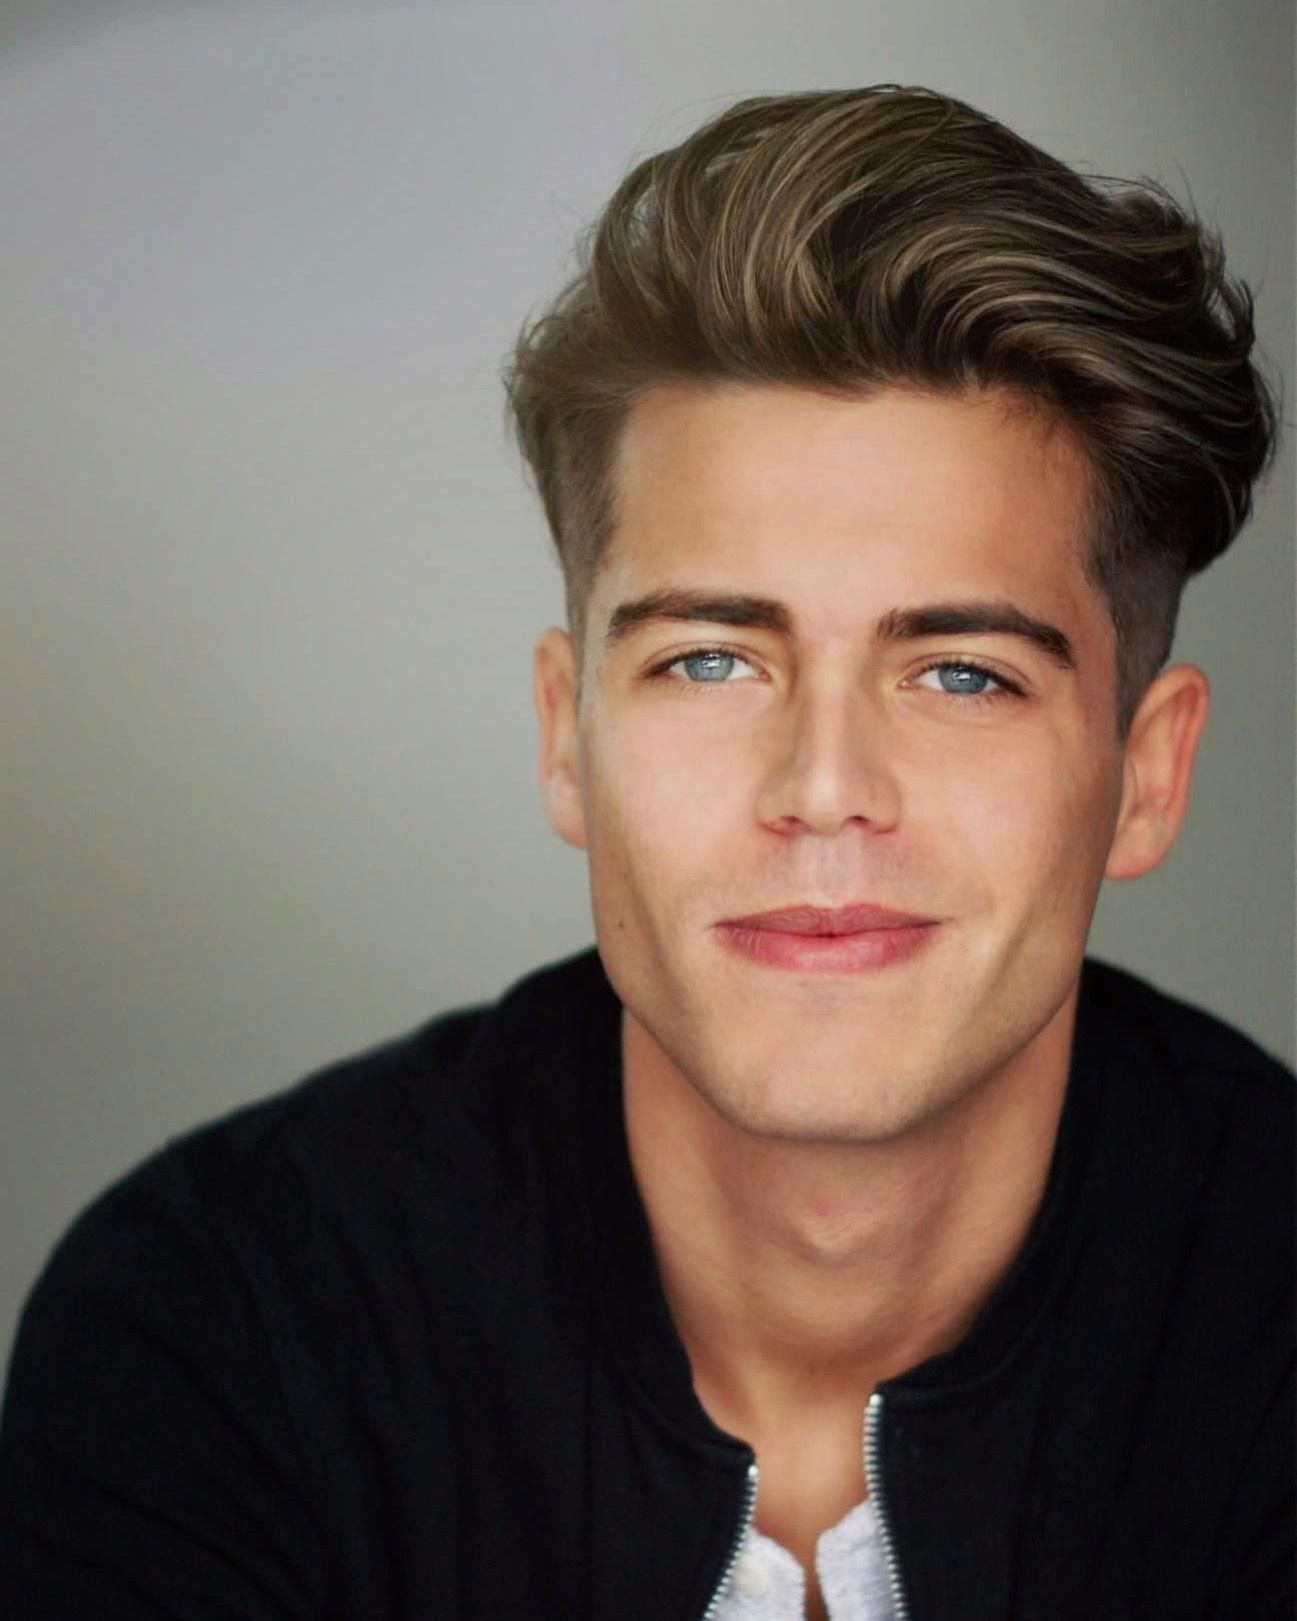 Top Dreadlocks Hairstyles For Men - Stylendesigns